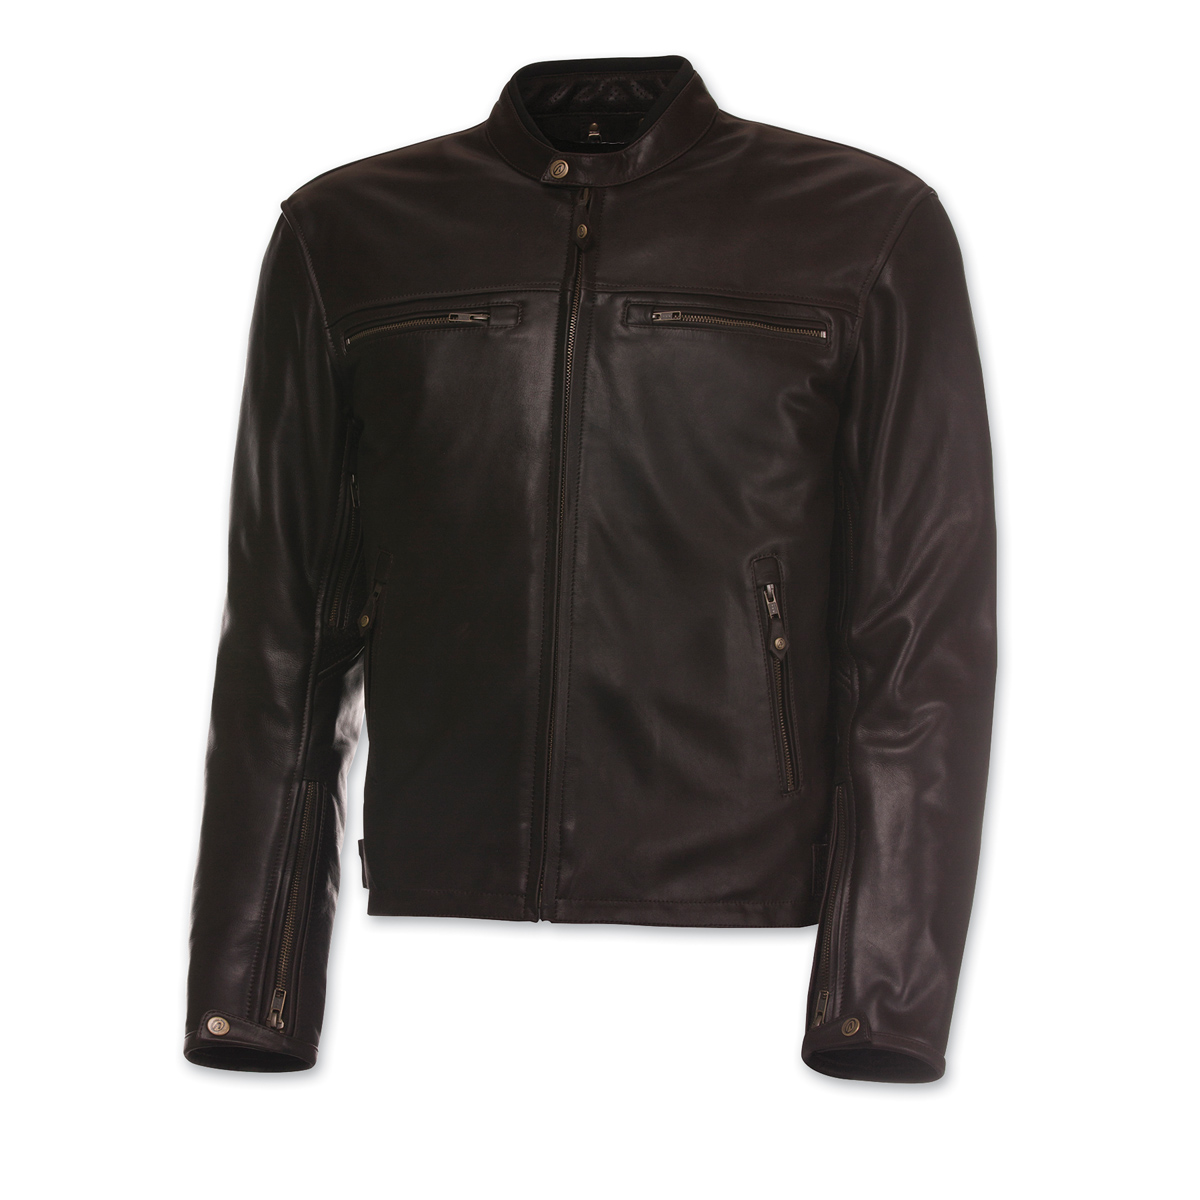 Olympia Moto Sports Men's Bishop Brown Leather Jacket